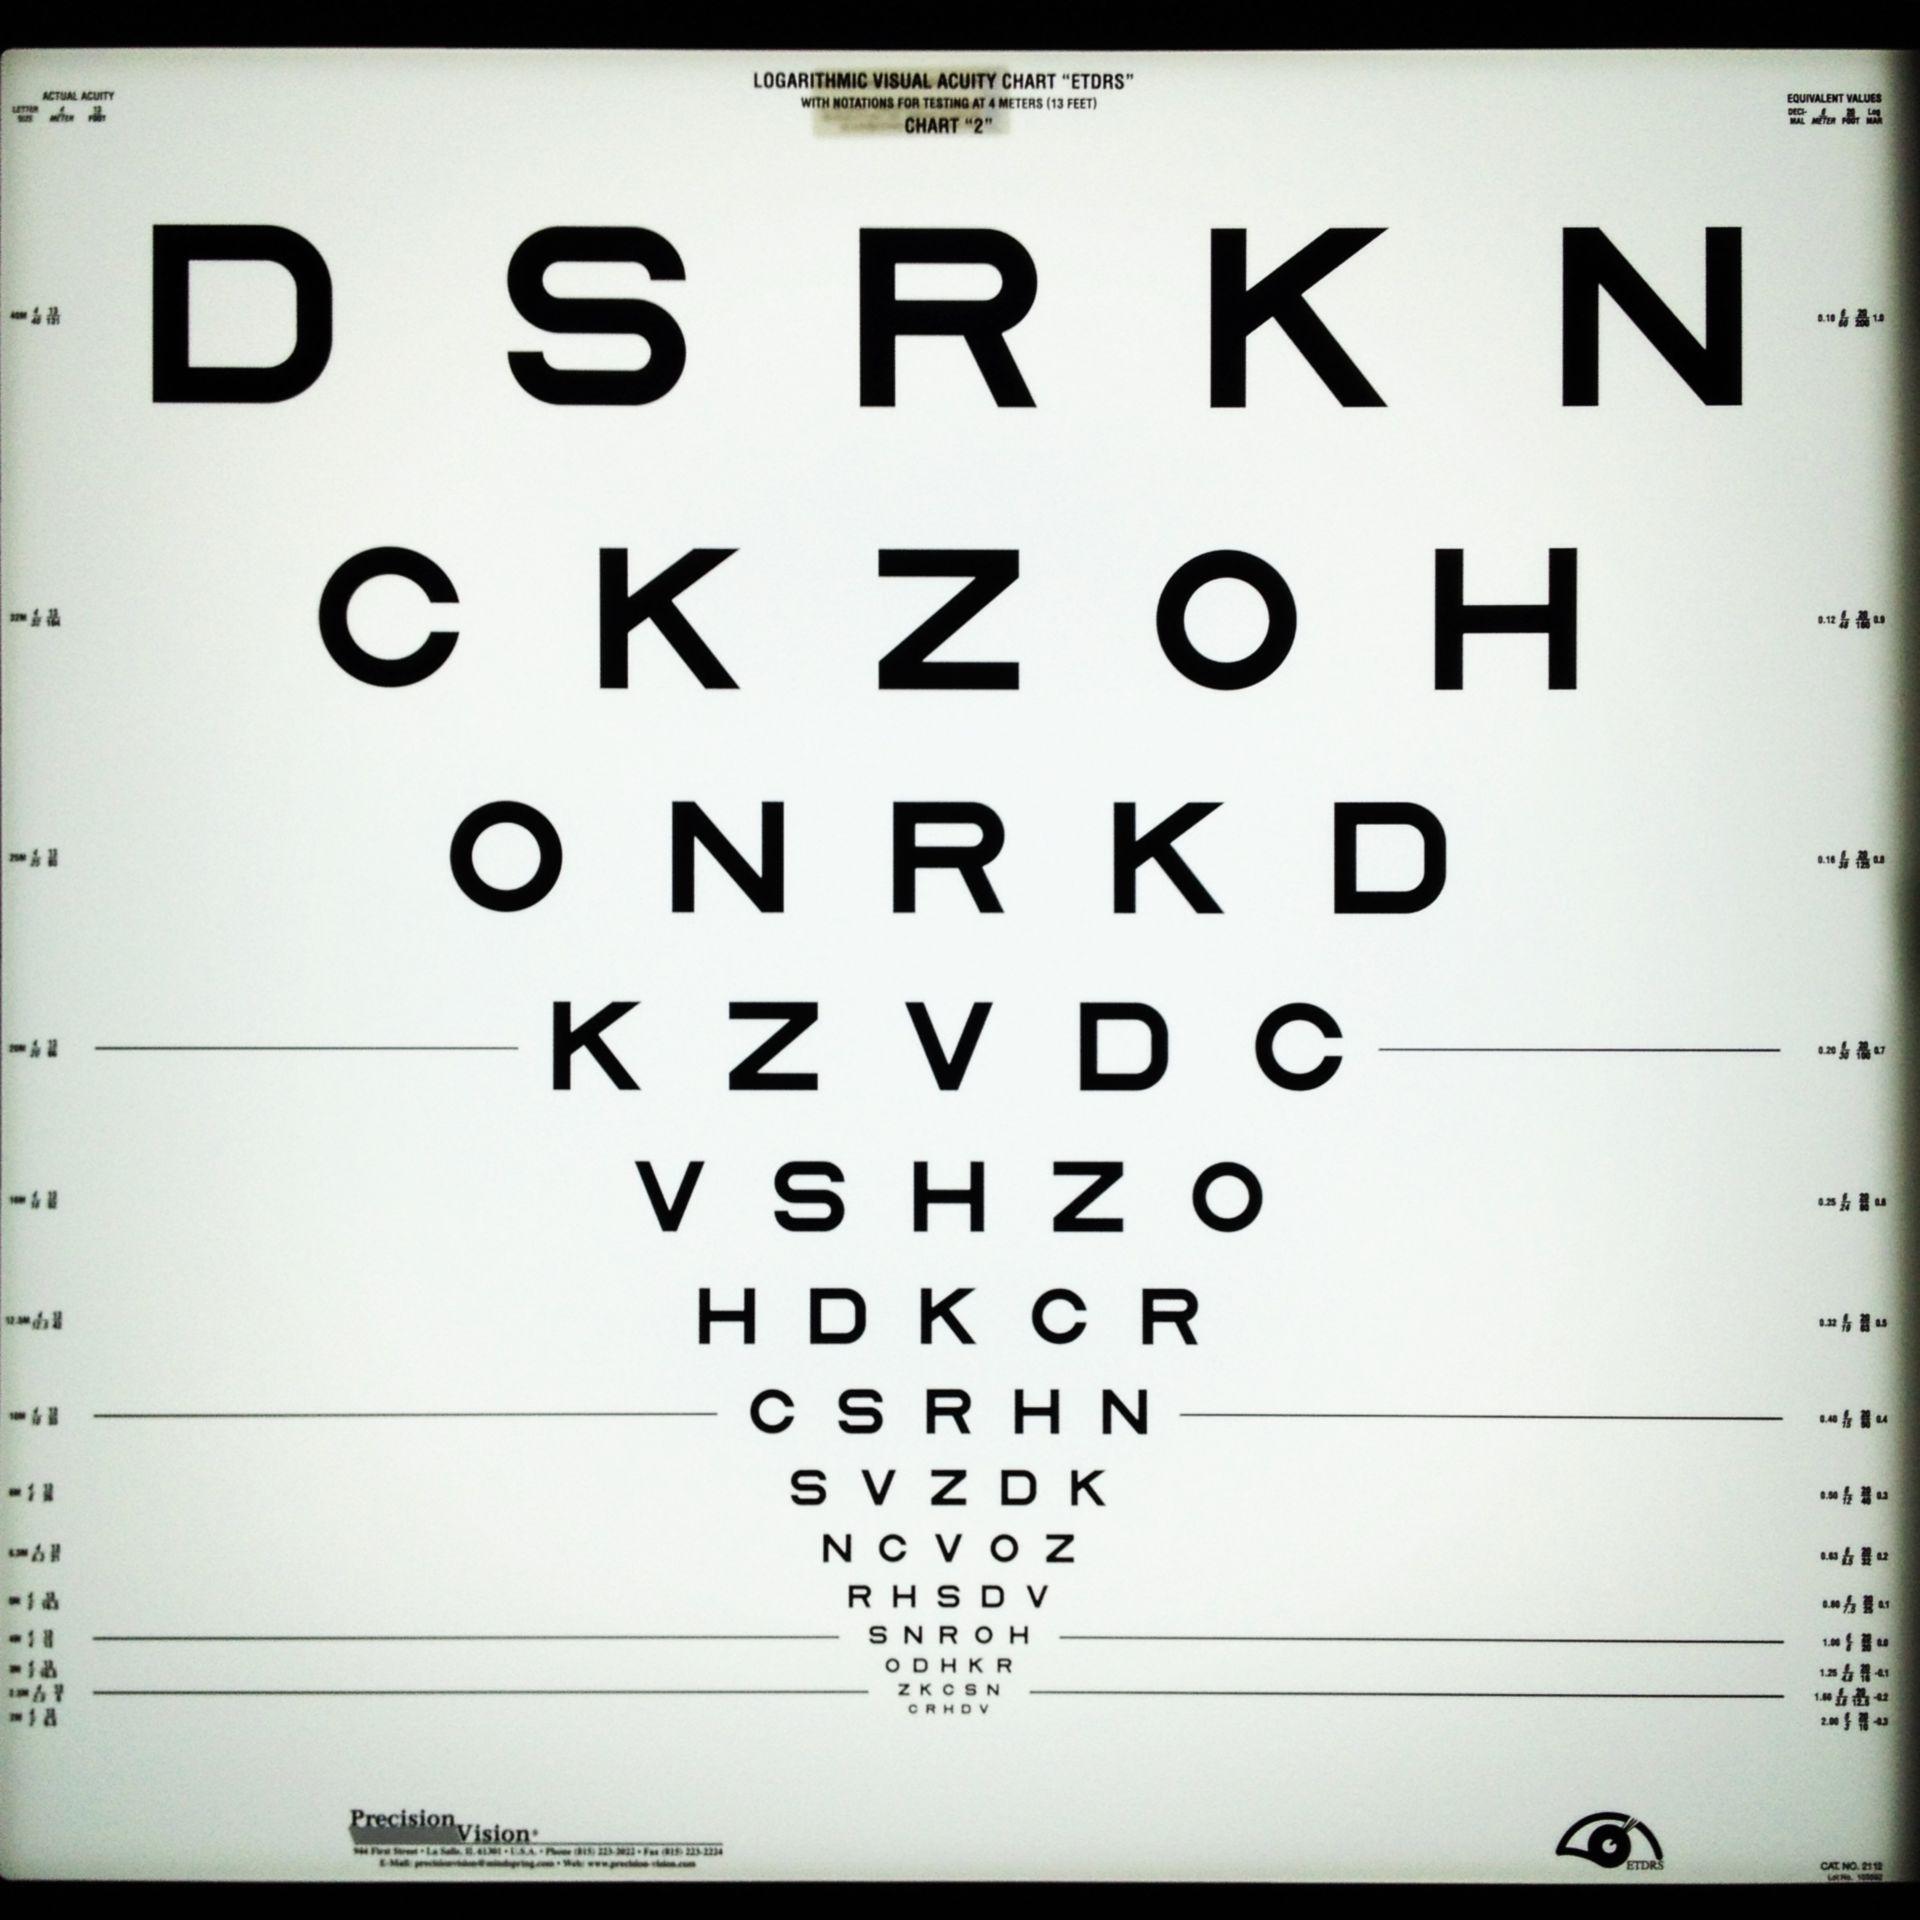 Tabla optométrica D